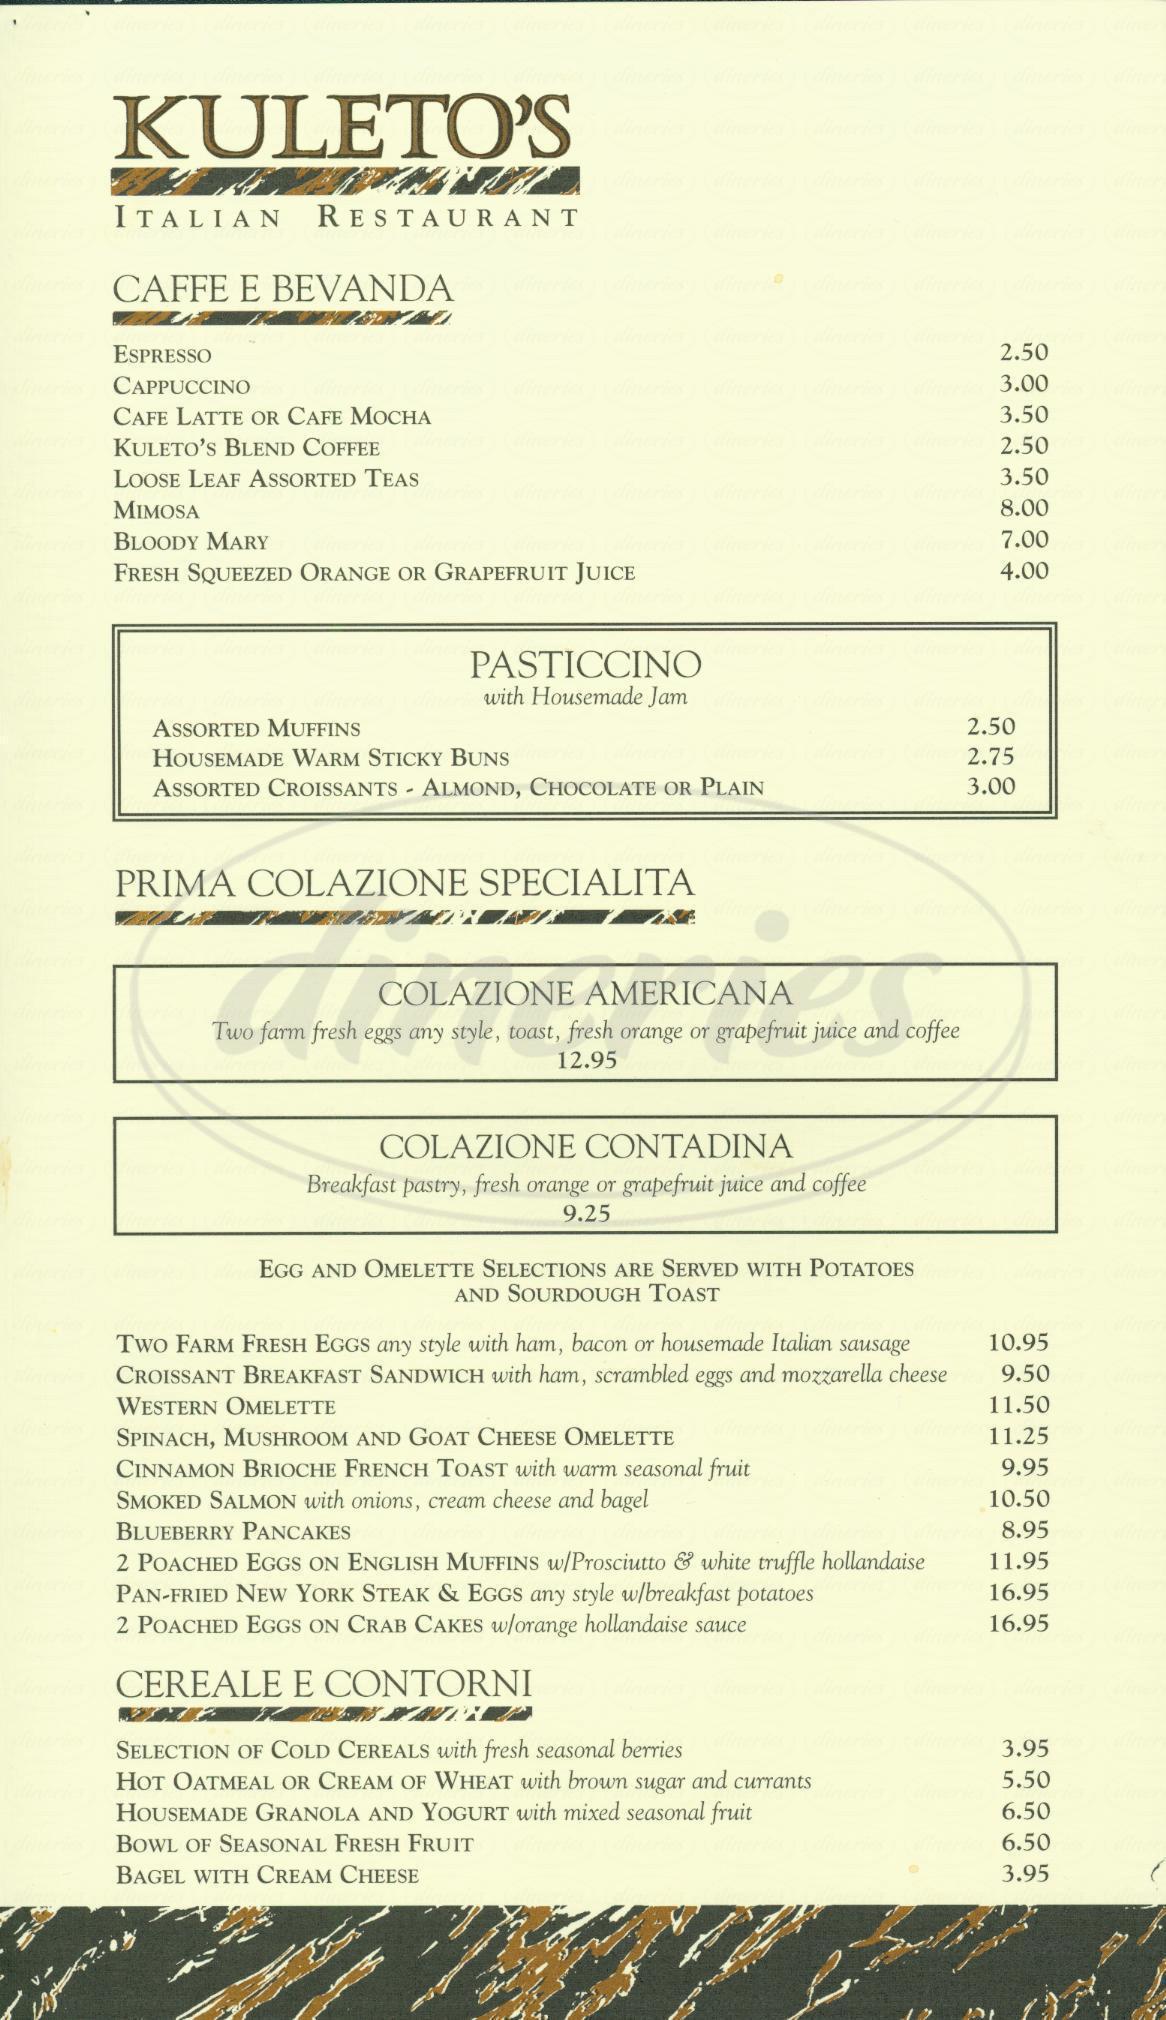 menu for Kuletos Restaurant